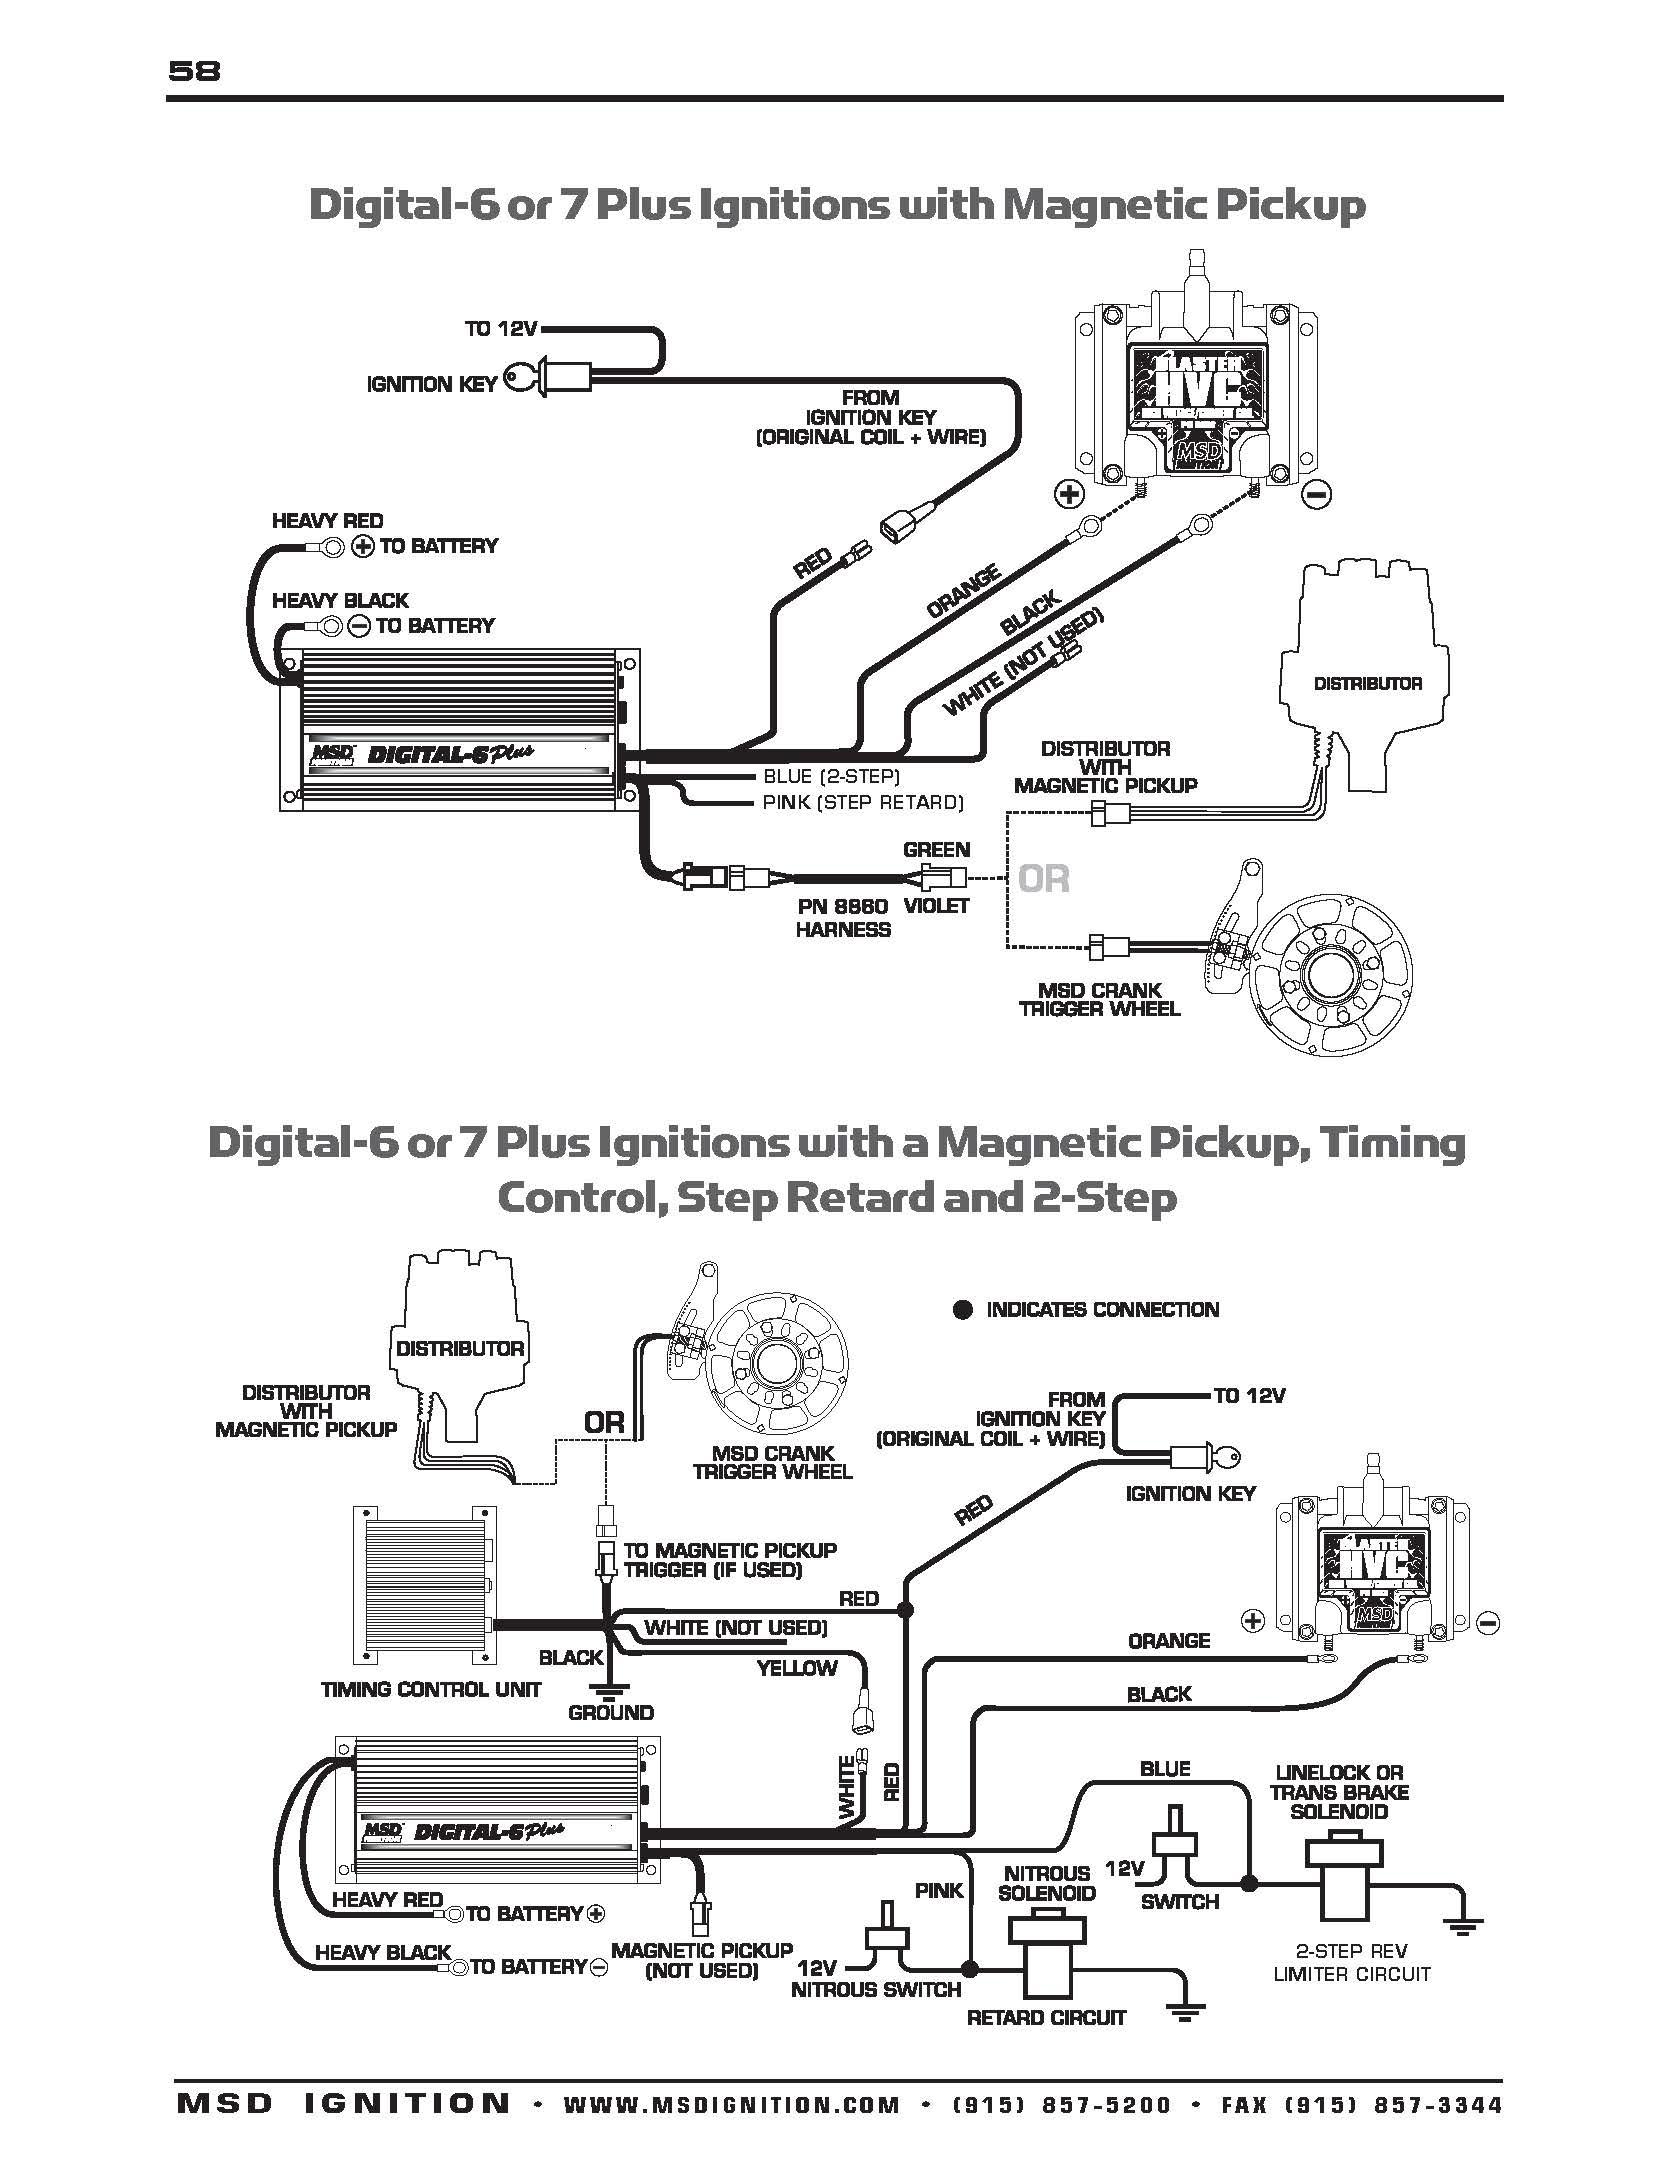 Msd Digital 6A Wiring Harness - Wiring Diagrams Hubs - Msd Digital 6Al Wiring Diagram